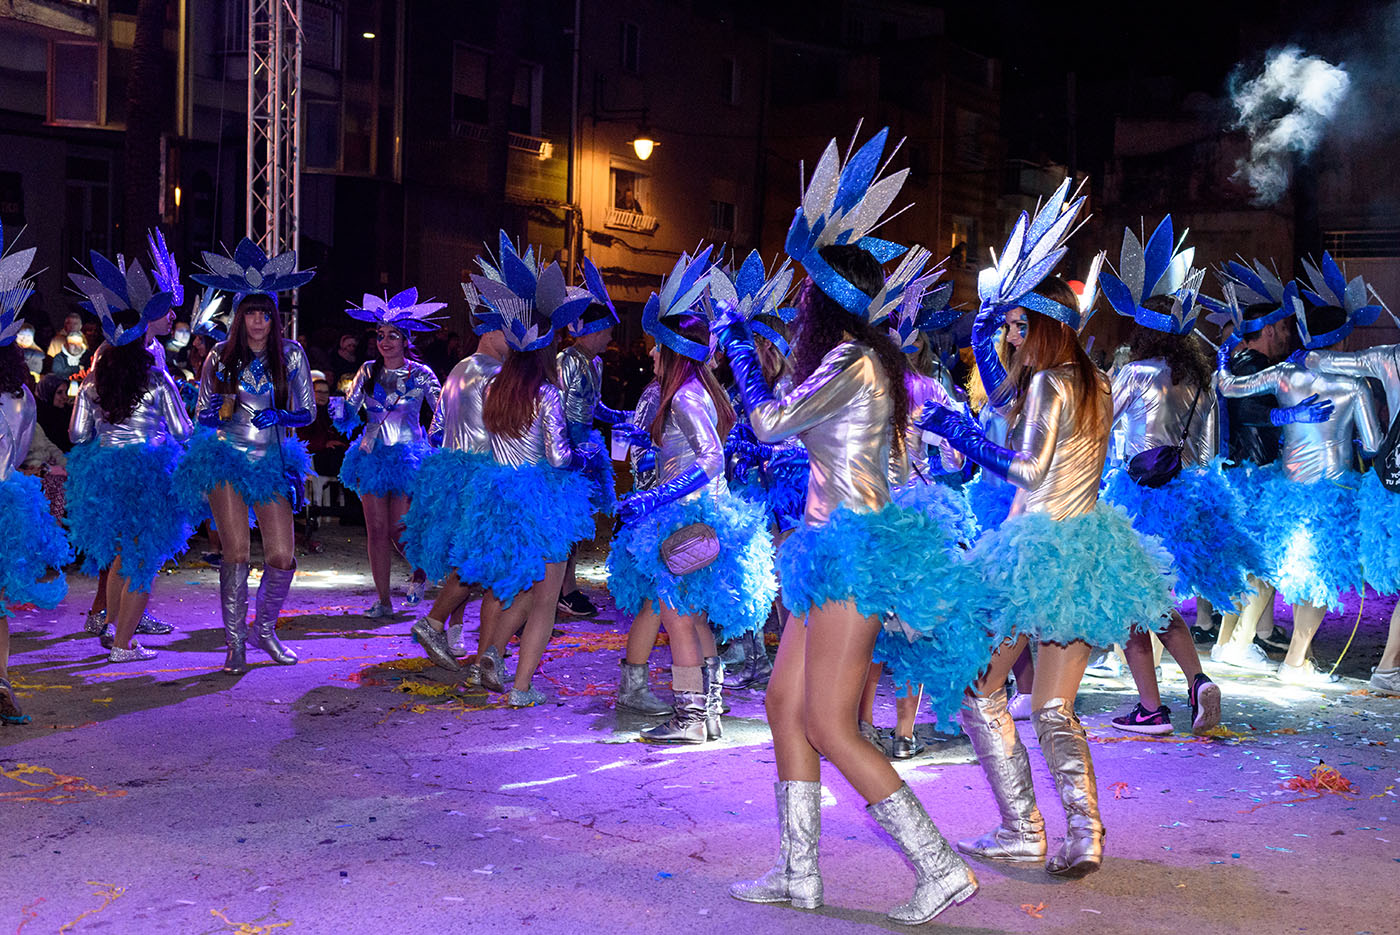 Turismo-Alcossebre_Carnaval_Alcala_de_Xivert_Comparsa_Azul_participantes